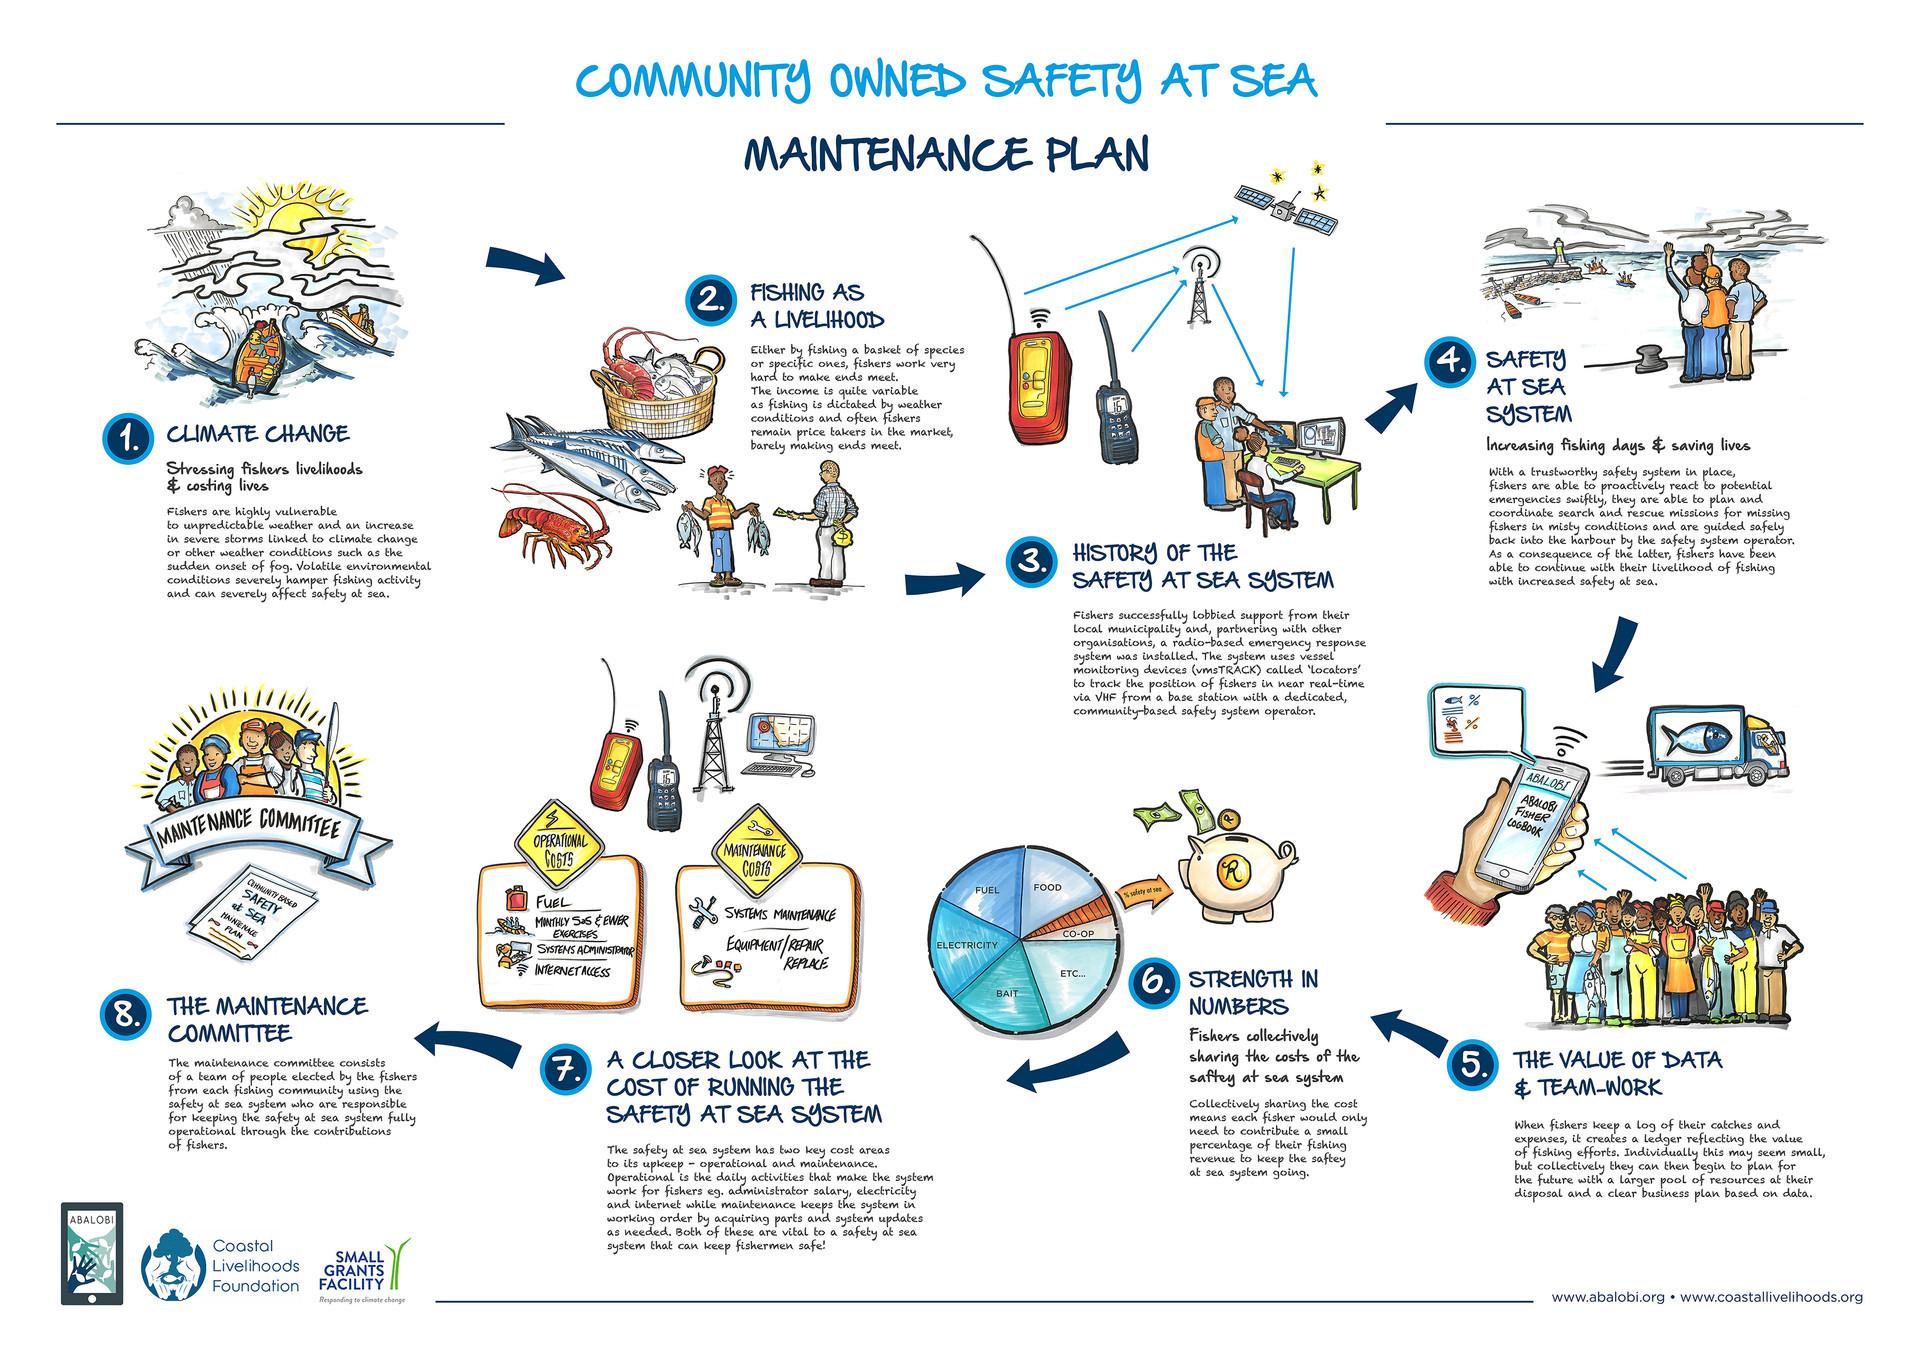 Abalobi SAS Maintenance Plan (A4).jpg